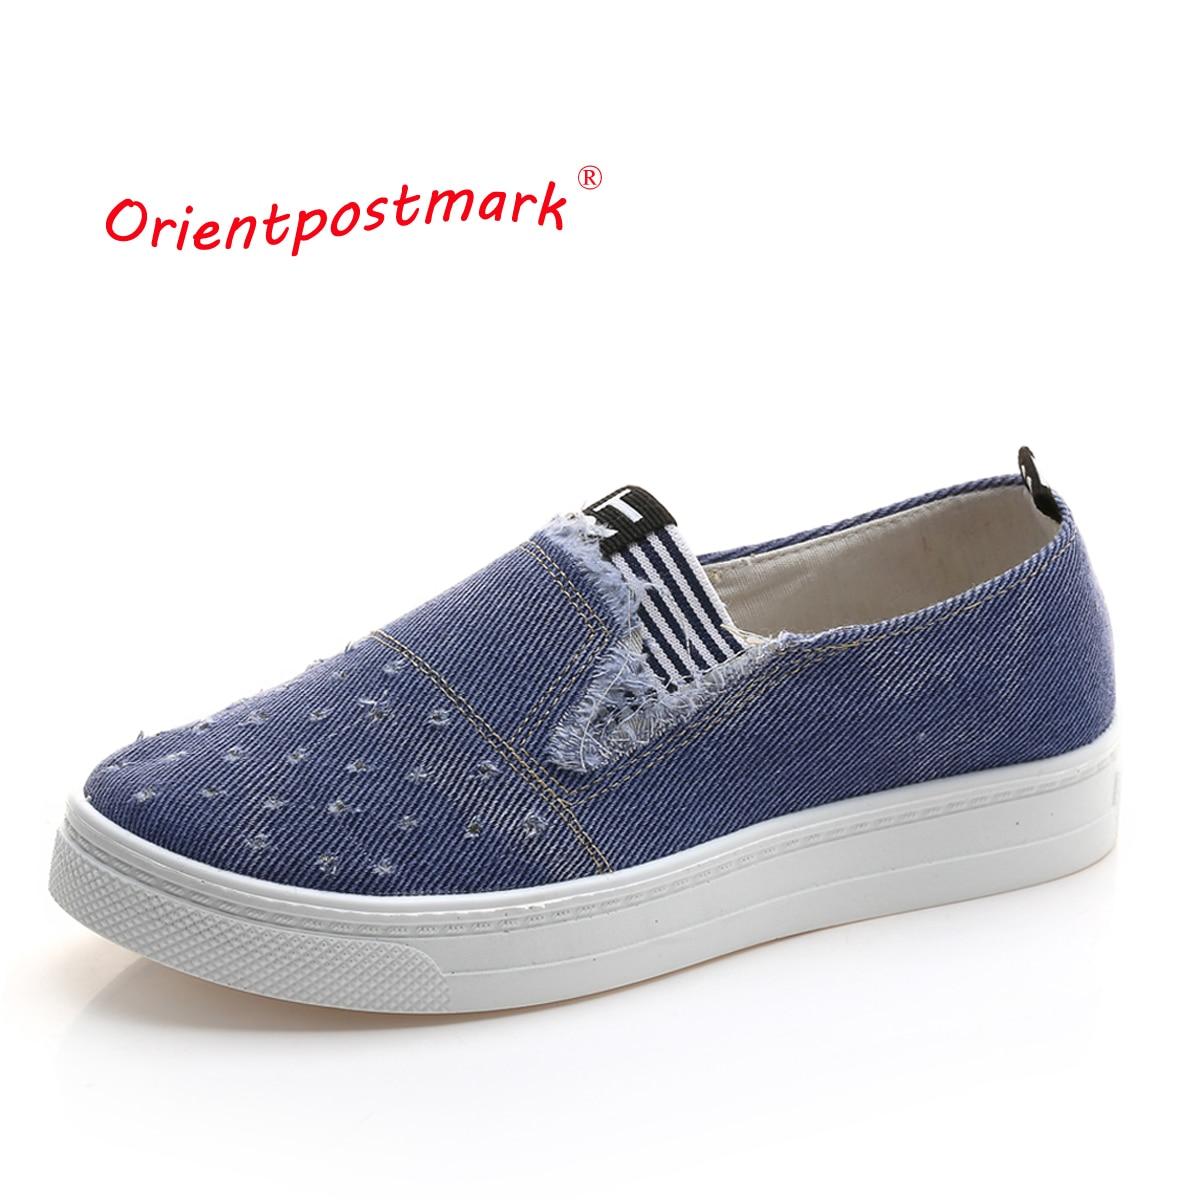 OrientPostMark Women Jeans Shoes flats Fashion Casual Denim Shoes Breathable Shoes High Quality Soft Soles Students Canvas Shoes